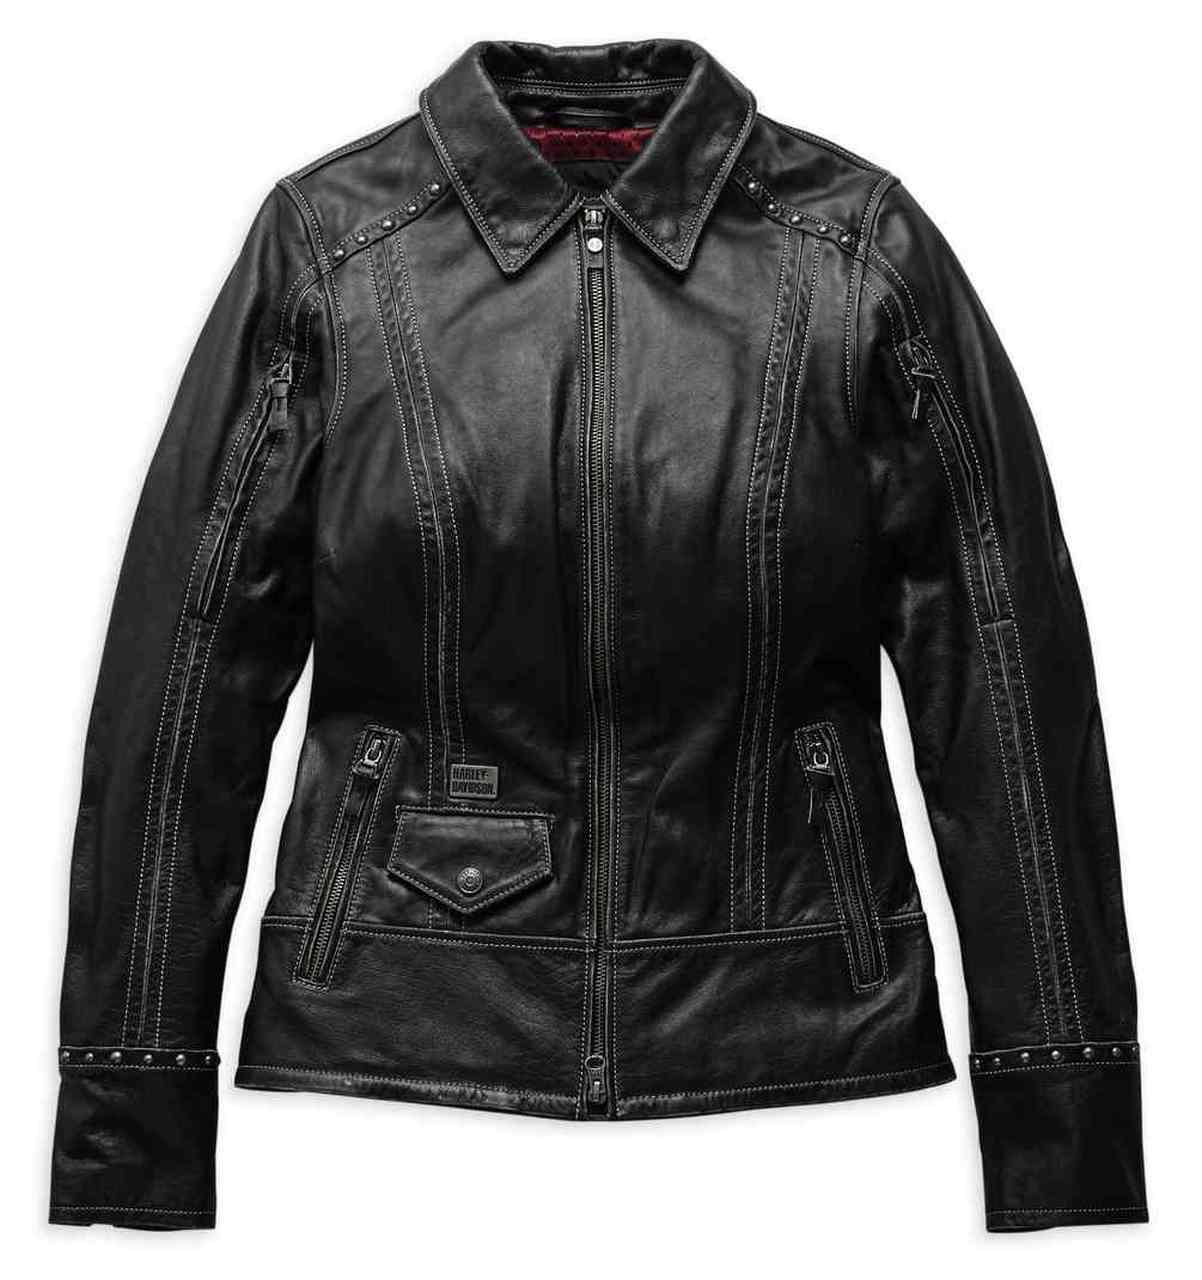 Harley-Davidson® Women's Intrepidity Vented Leather Jacket, Black